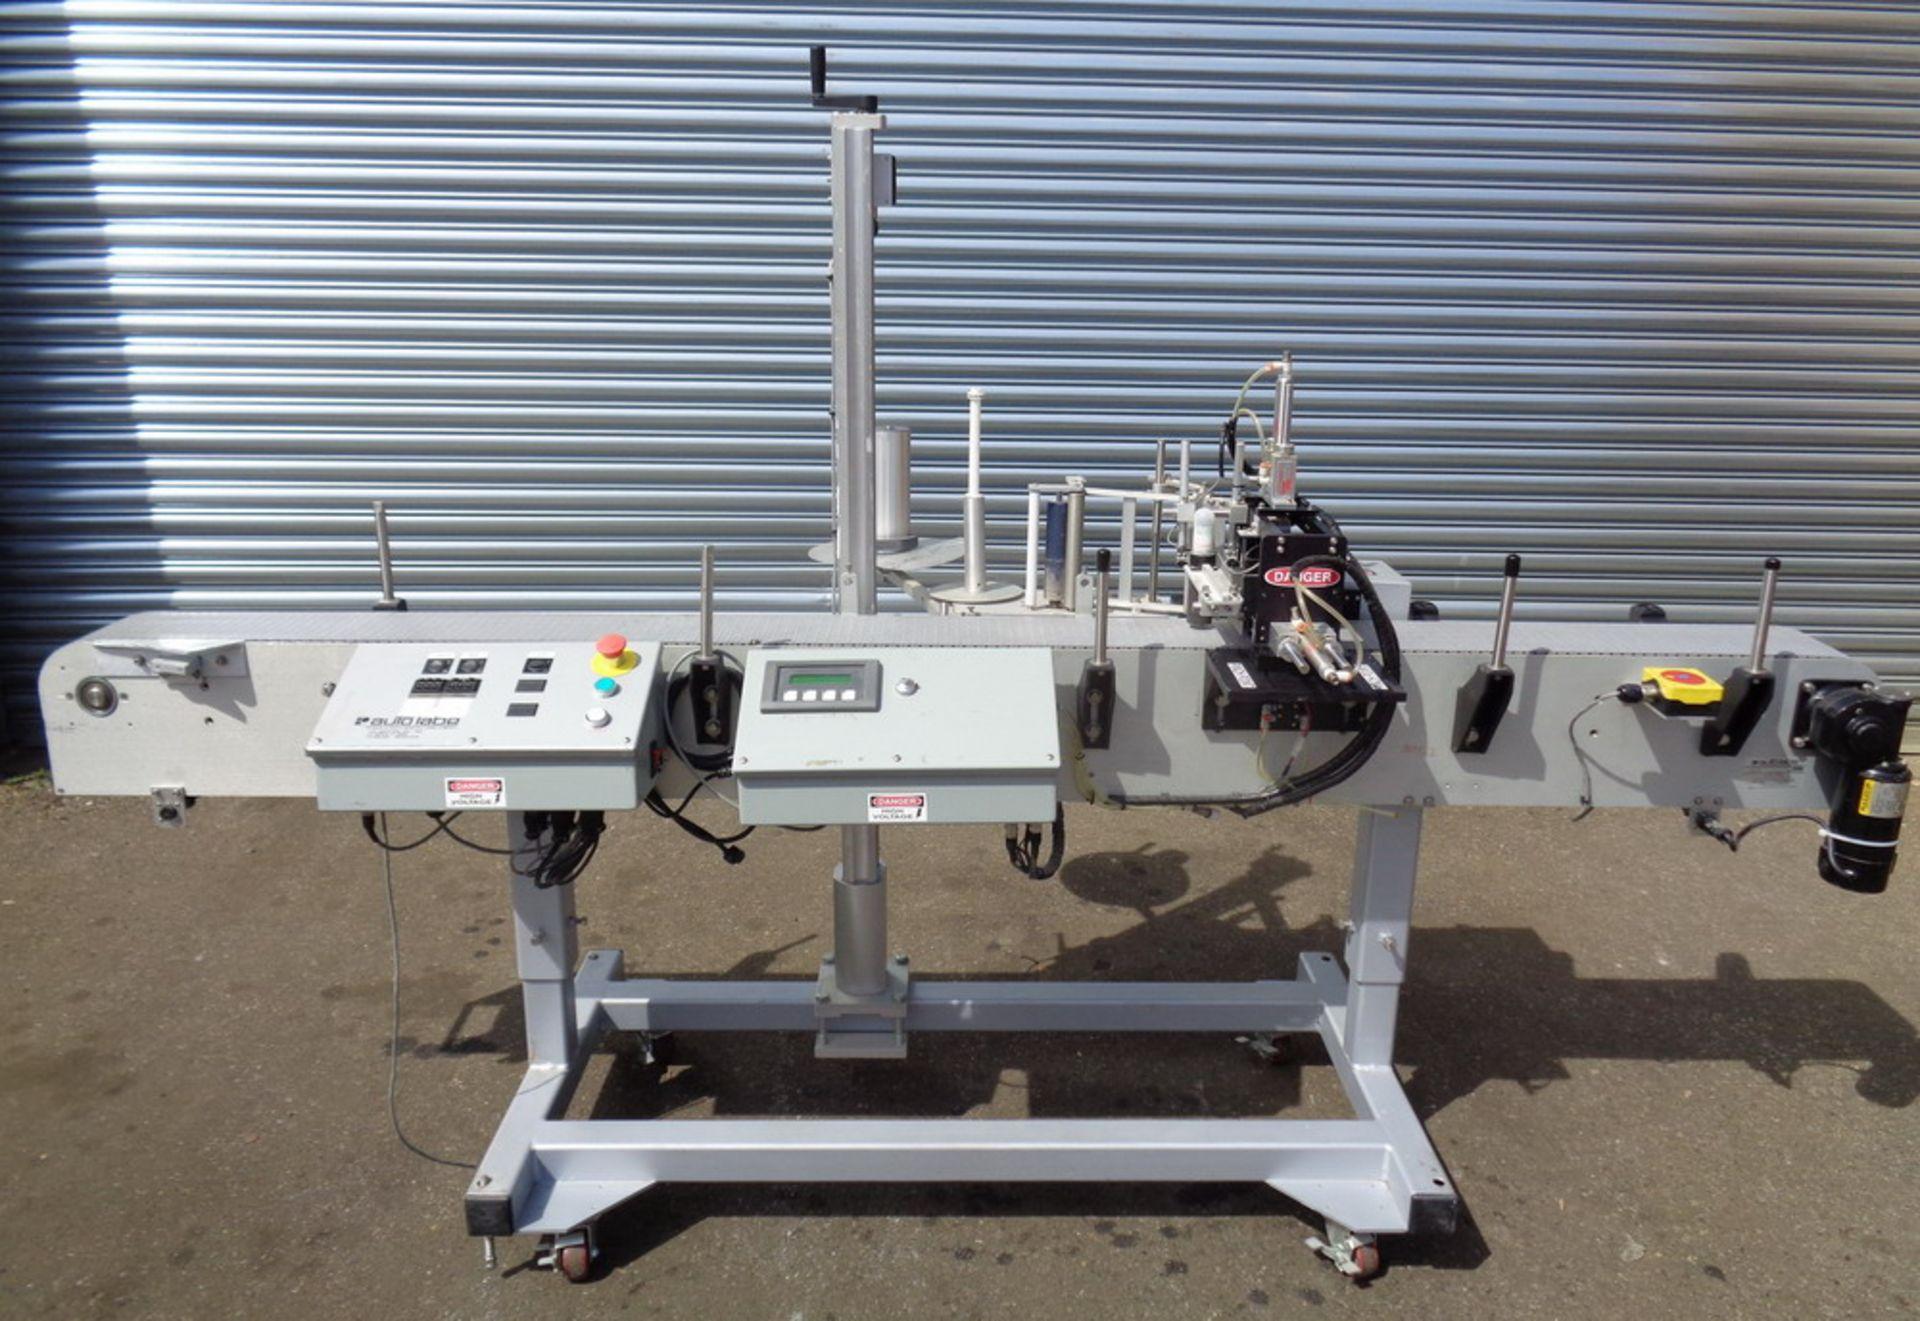 Lot 99 - AutoLabe Single Head Pressure Sensitive Labeler, Model 620, S/N 070481